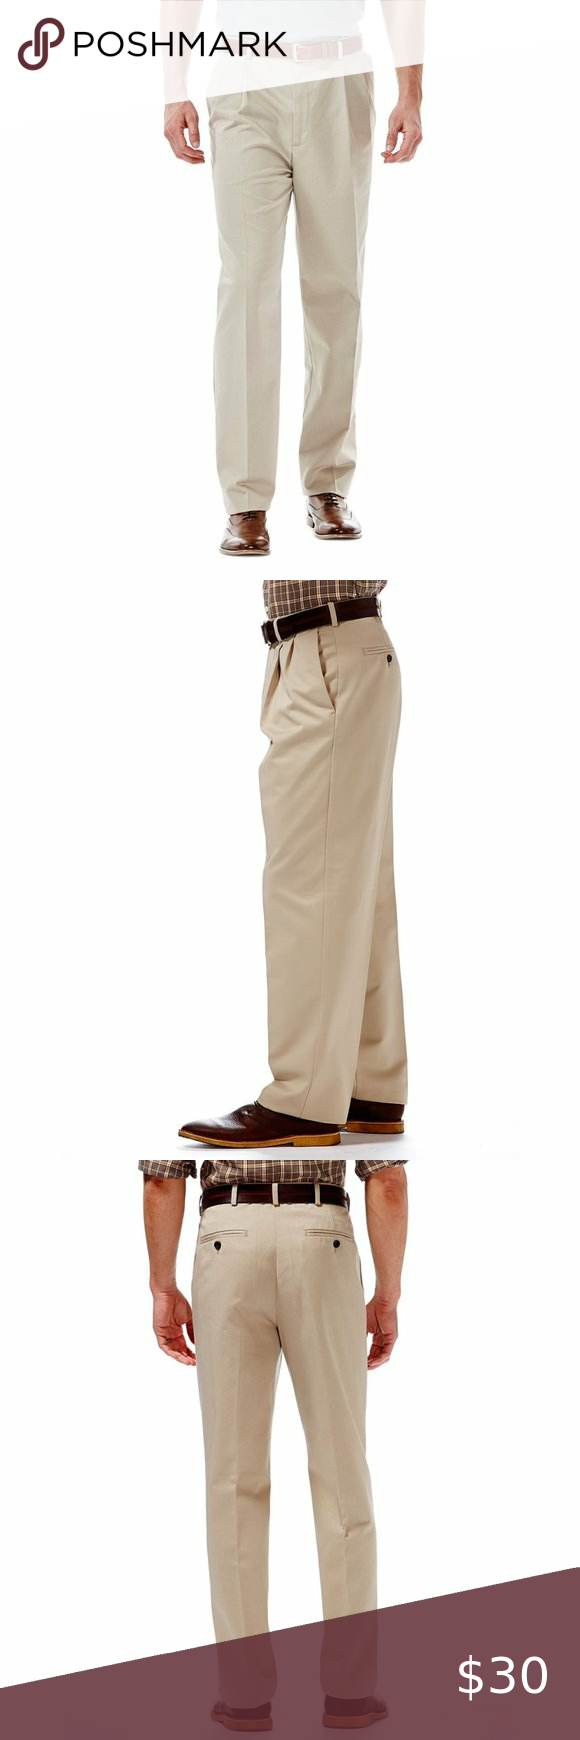 Nwt Mens Size 34x34 Haggar Flat Front Khaki Pants In 2020 Khaki Pants Khaki Pants Work Haggar